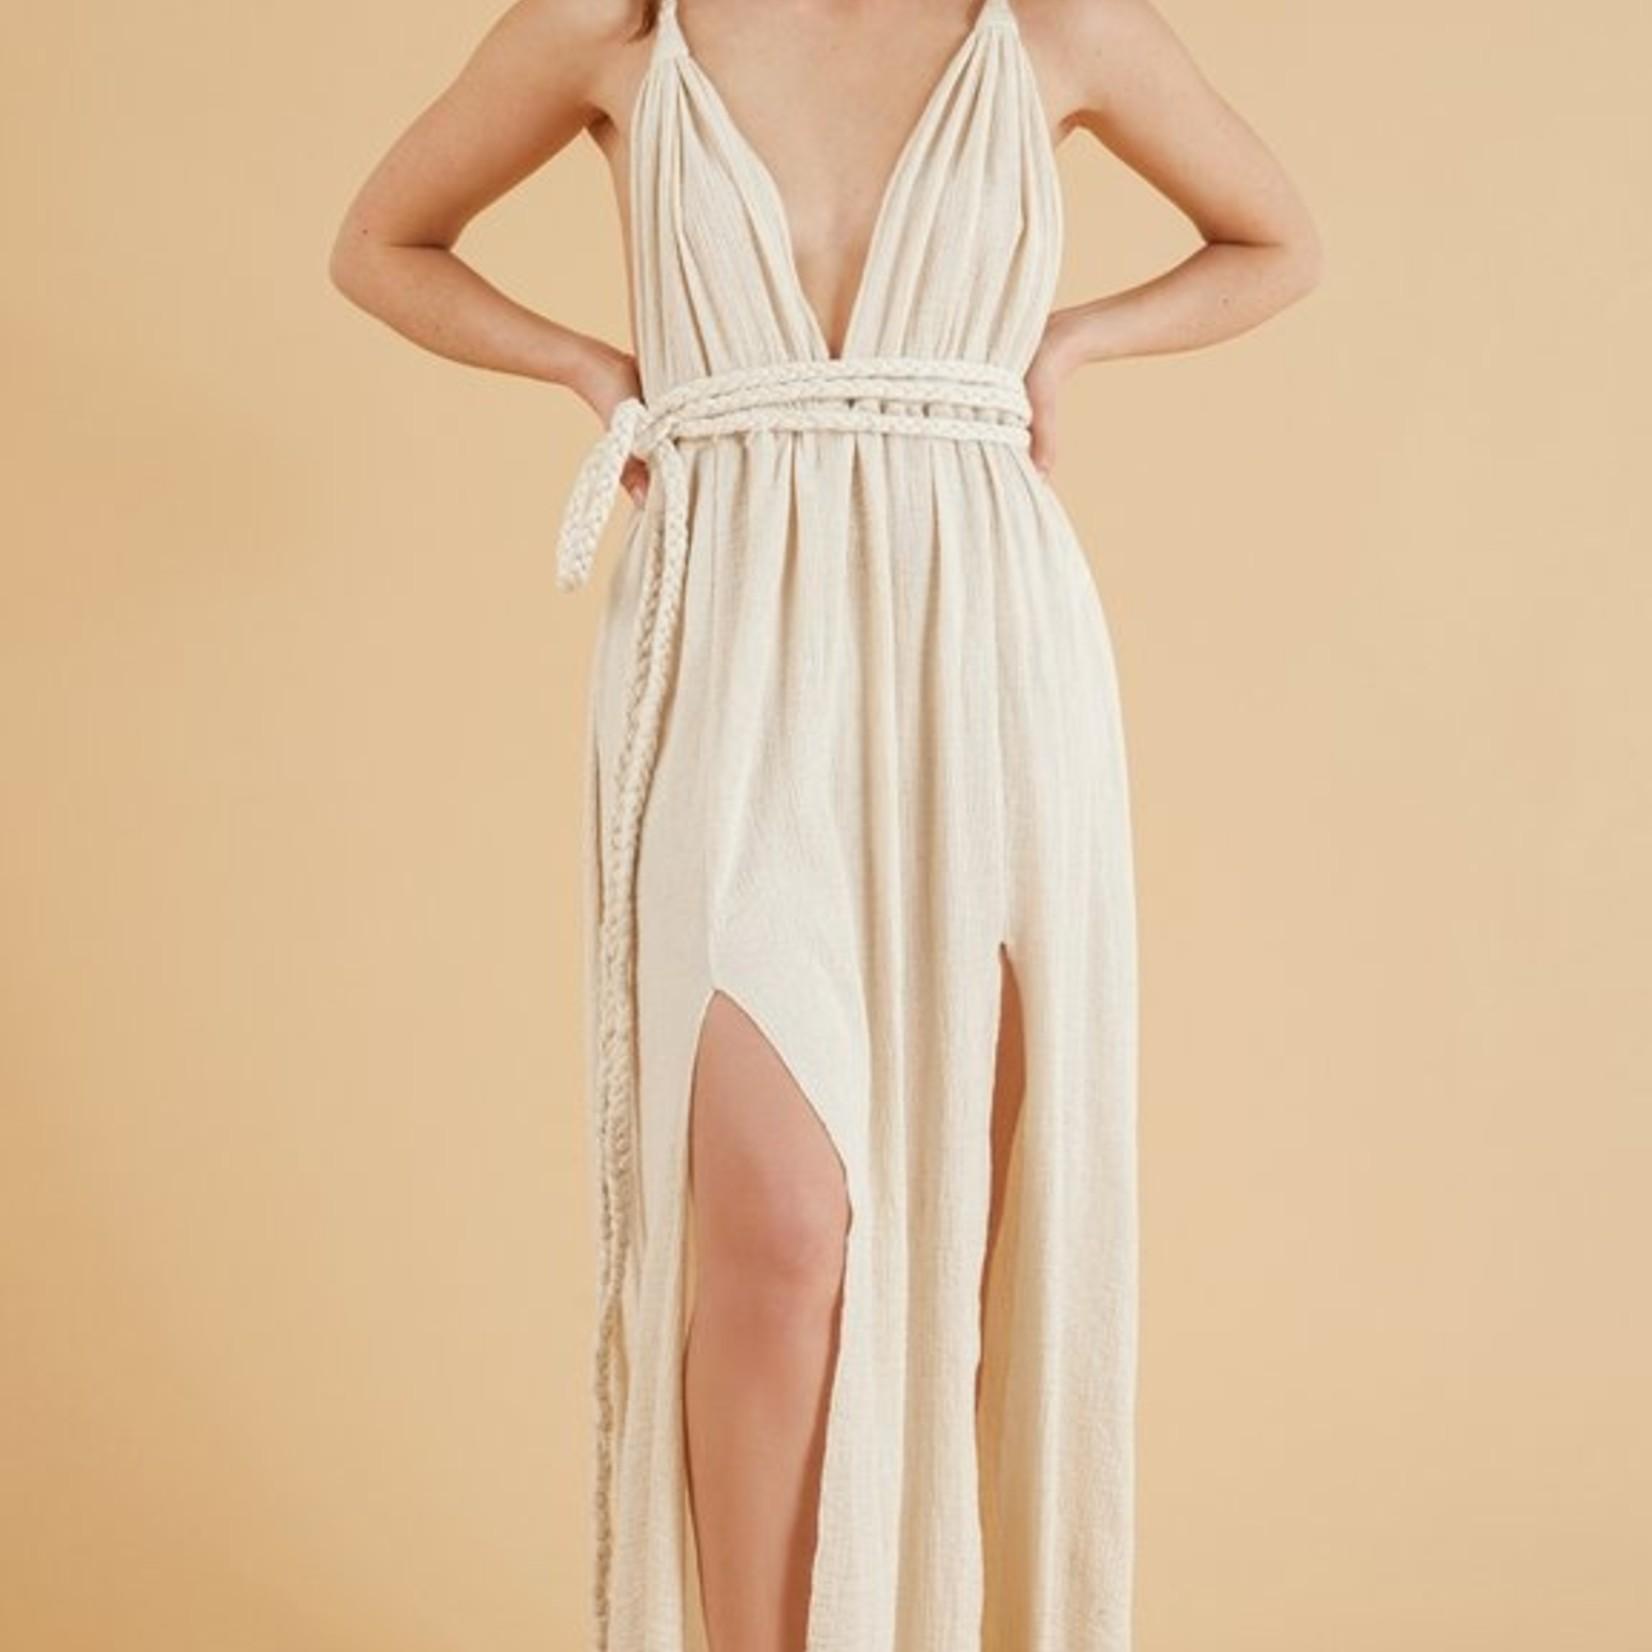 Handloom Muse Braided Dress